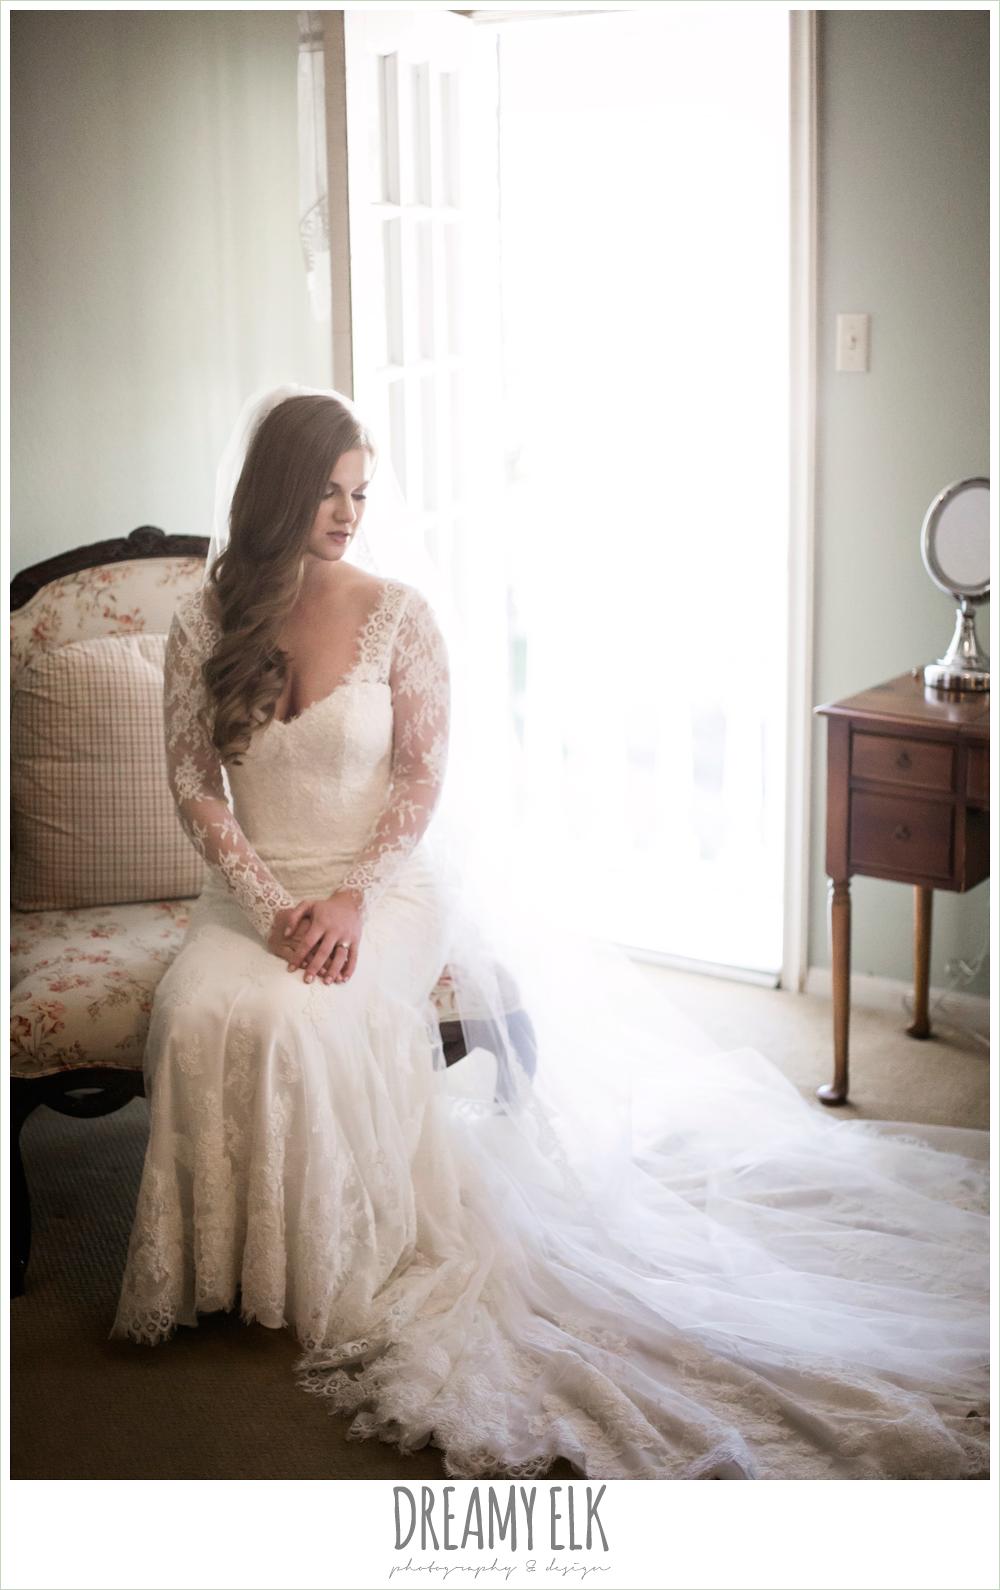 inside bridal portrait, wedding hair down, long sleeve lace wedding dress, morning winter january wedding, ashelynn manor {dreamy elk photography and design}